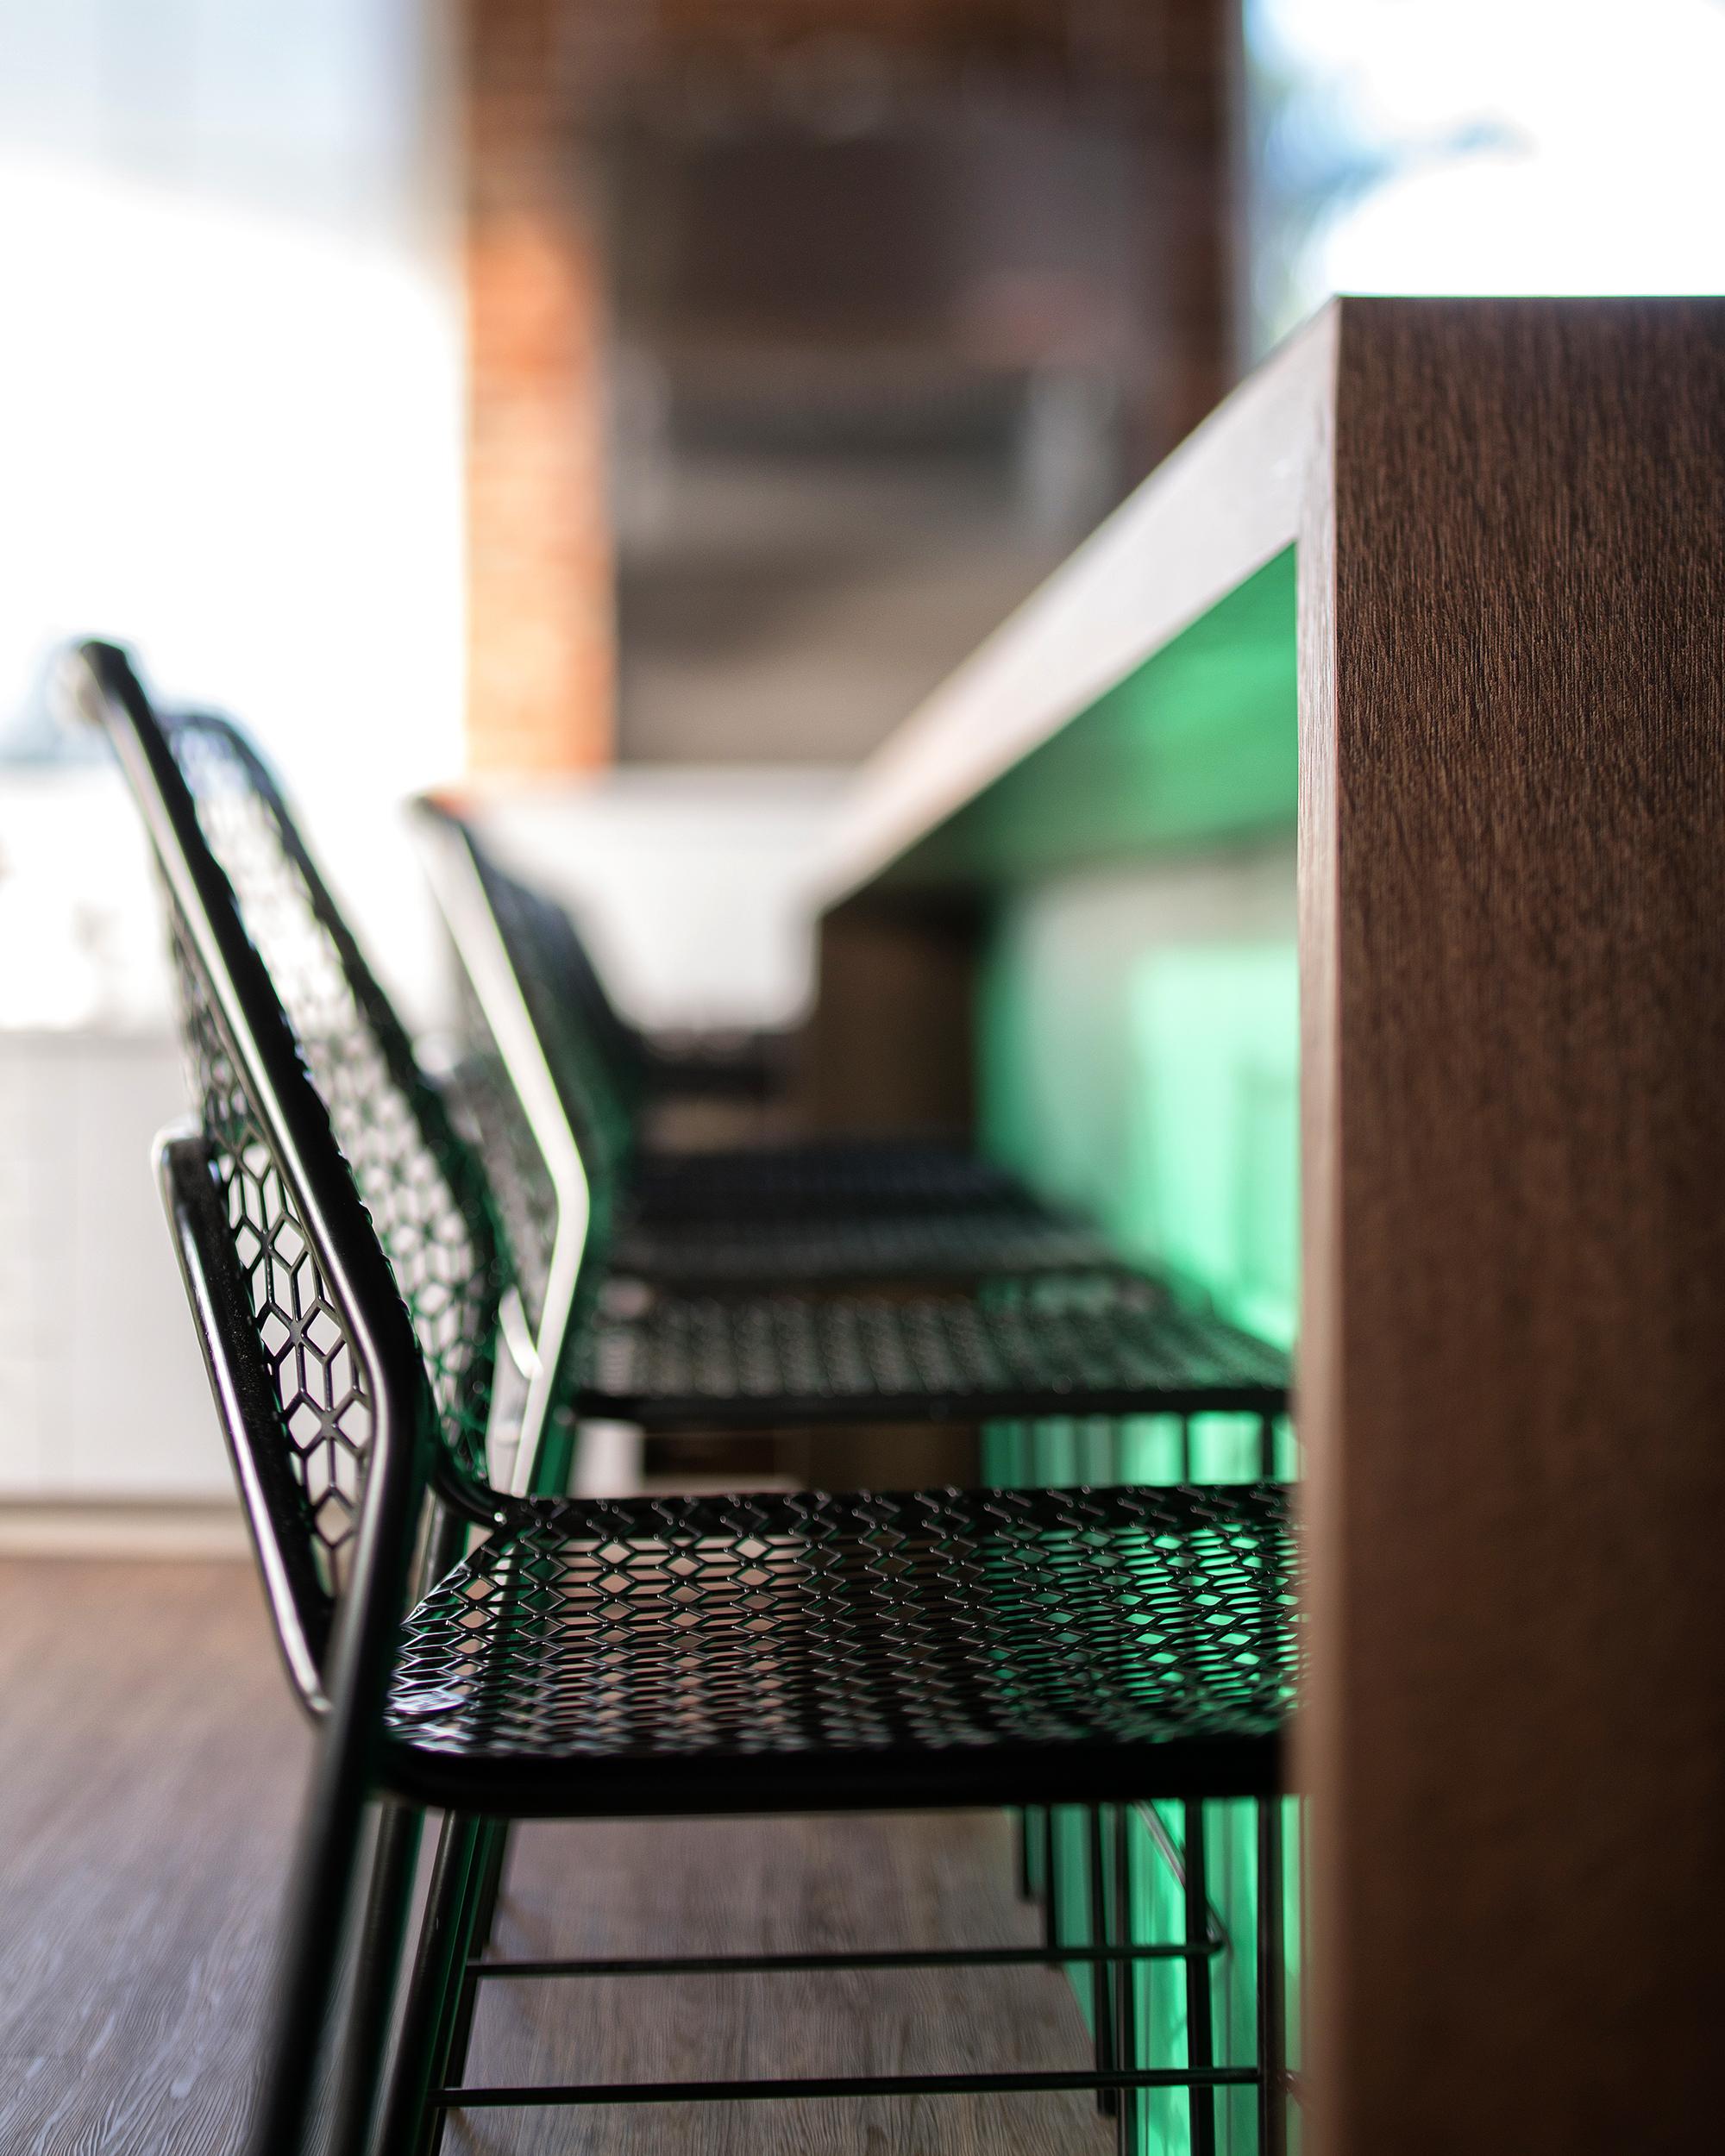 Transferwise---Break-Room-Bar-and-Seatin